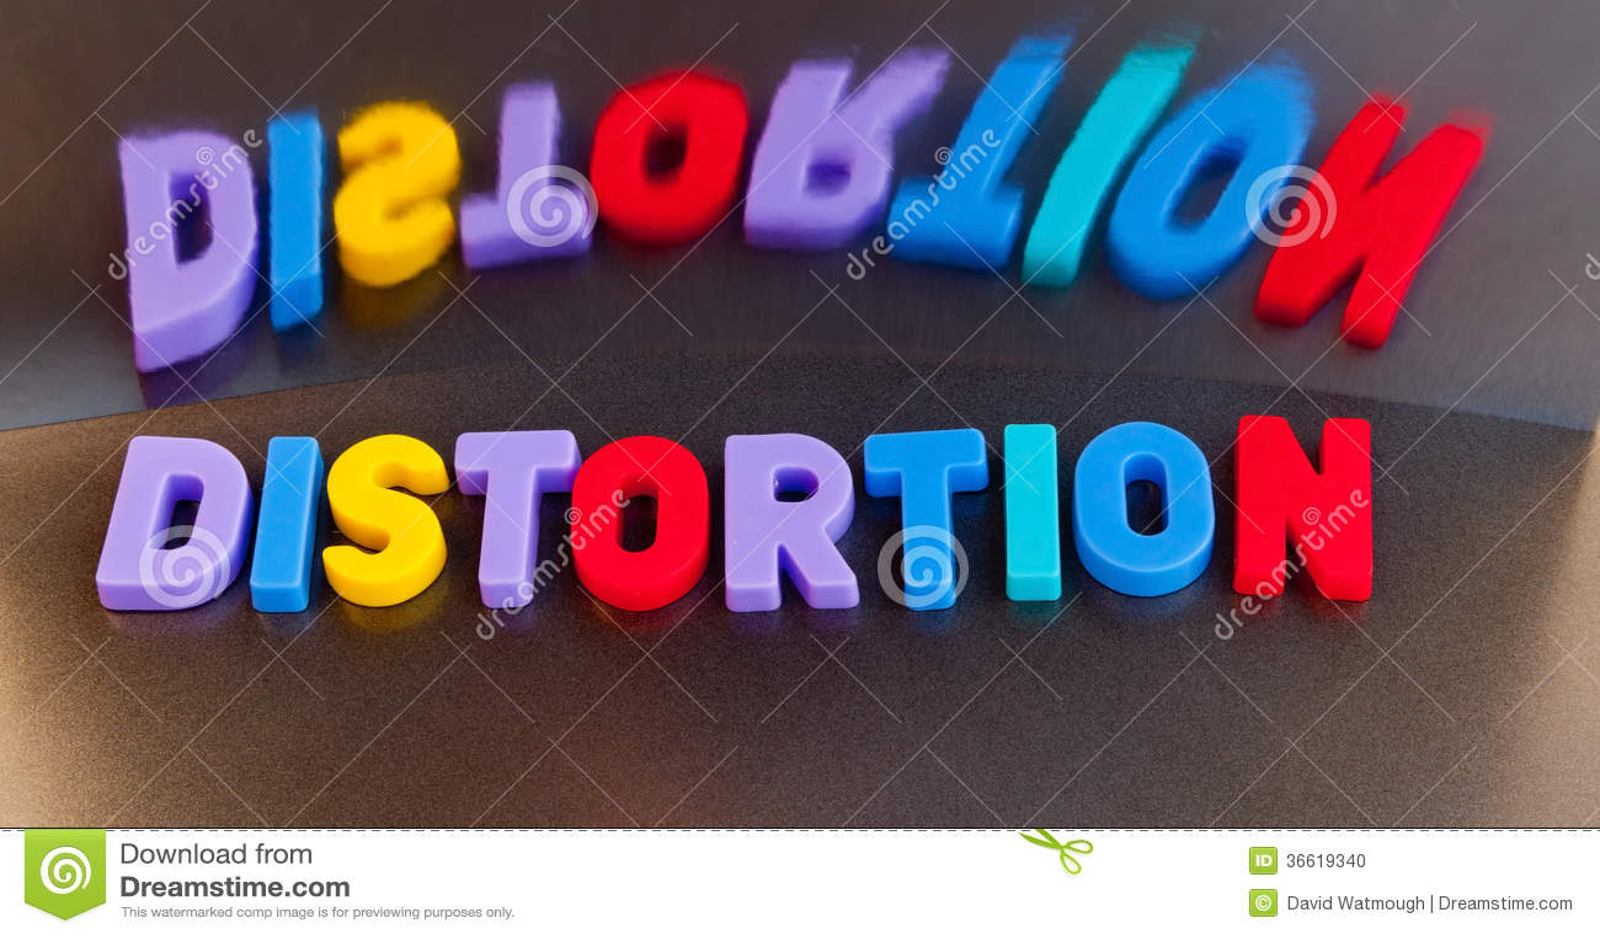 Distortion,